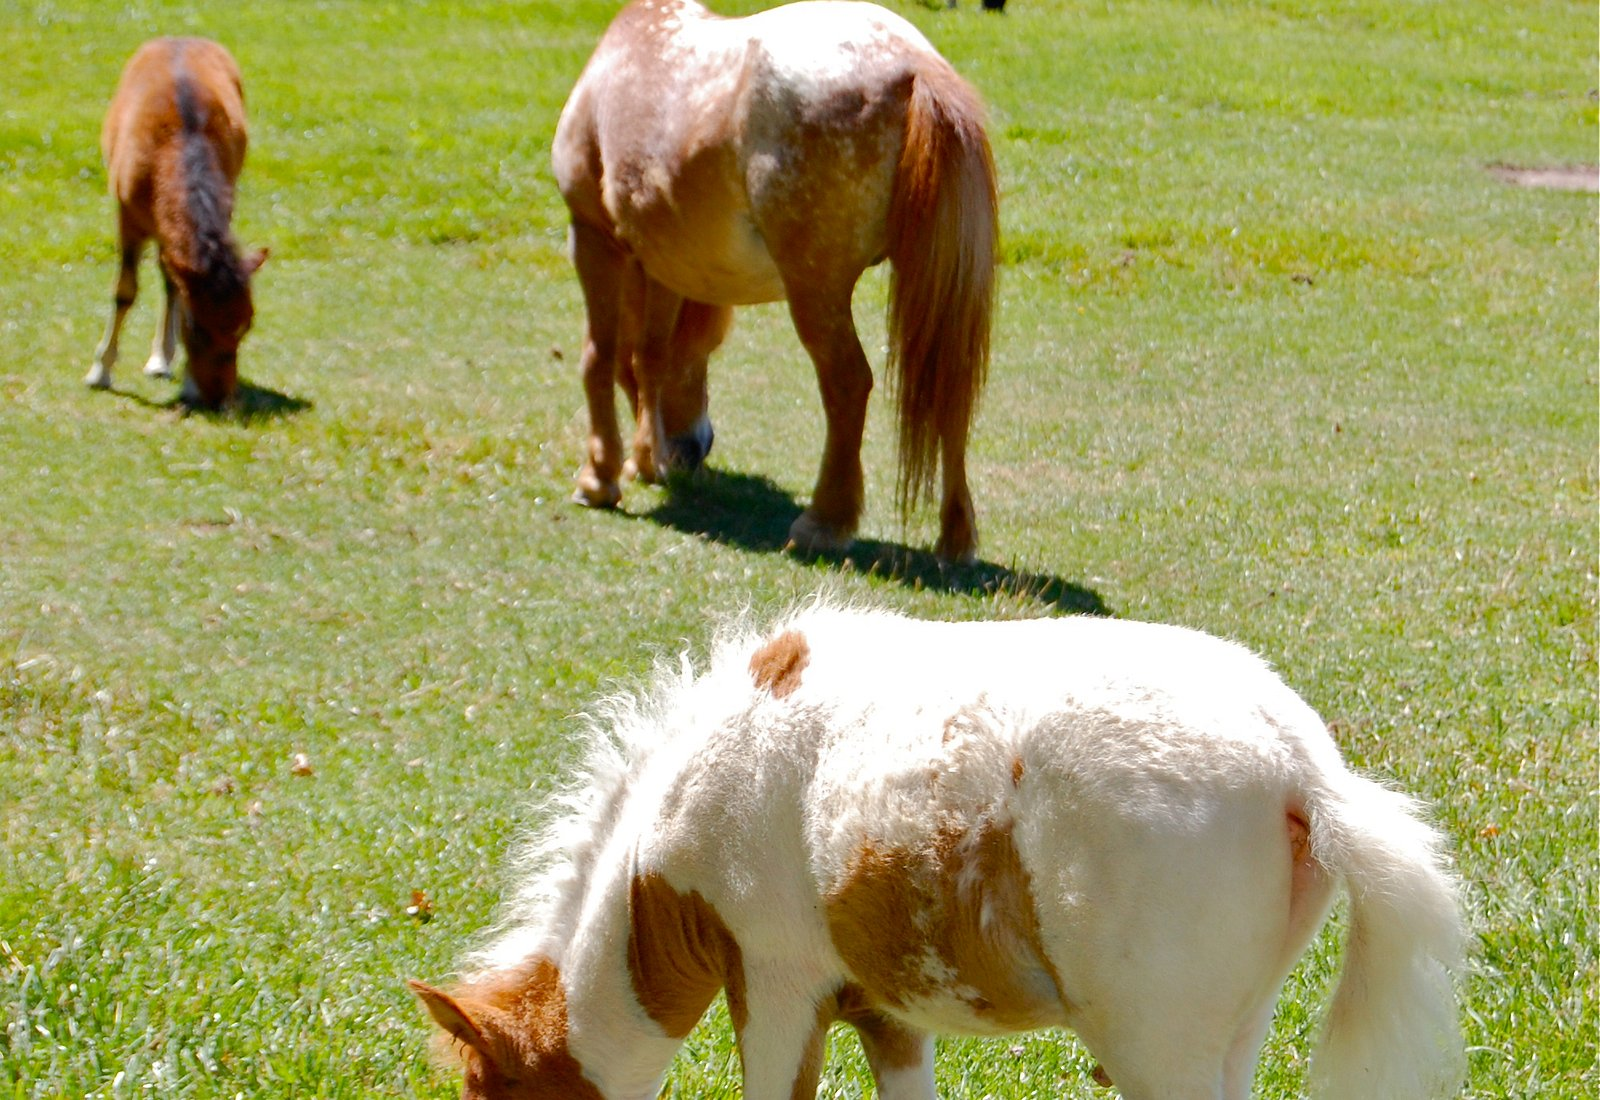 A sampling of the teeniest of horses!